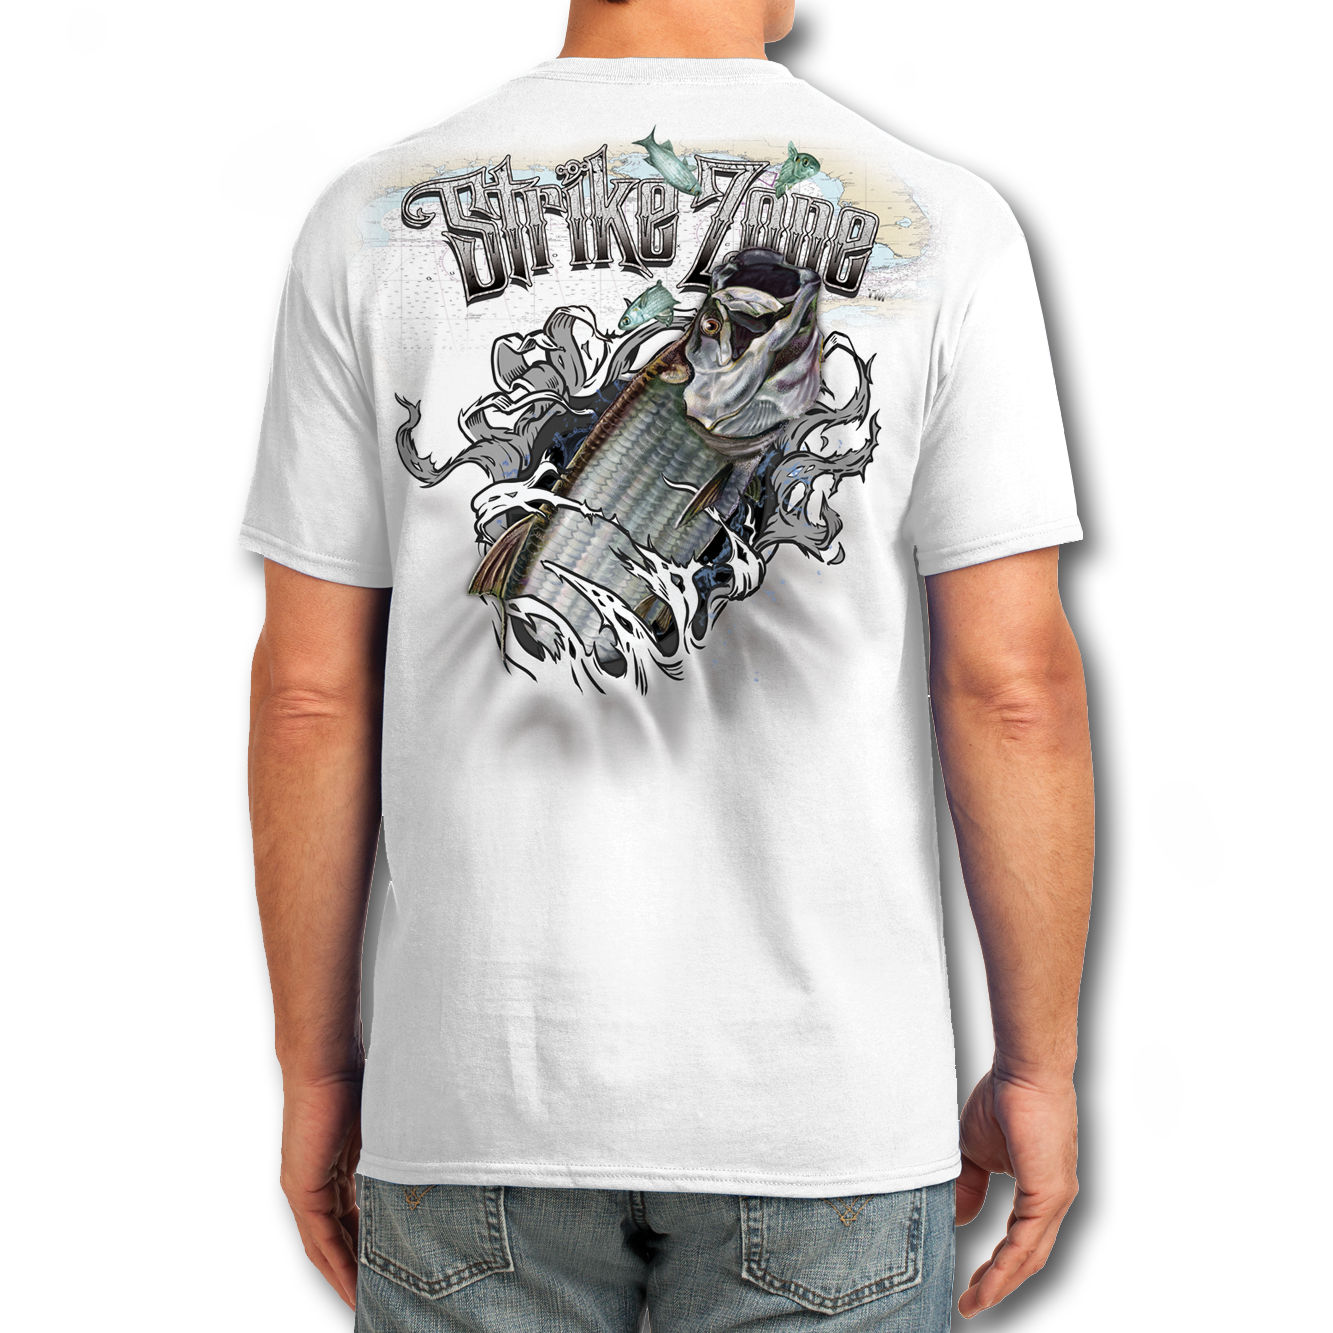 t-shirt-short-sleeve-white-jason-mathias-art-tarpon.png